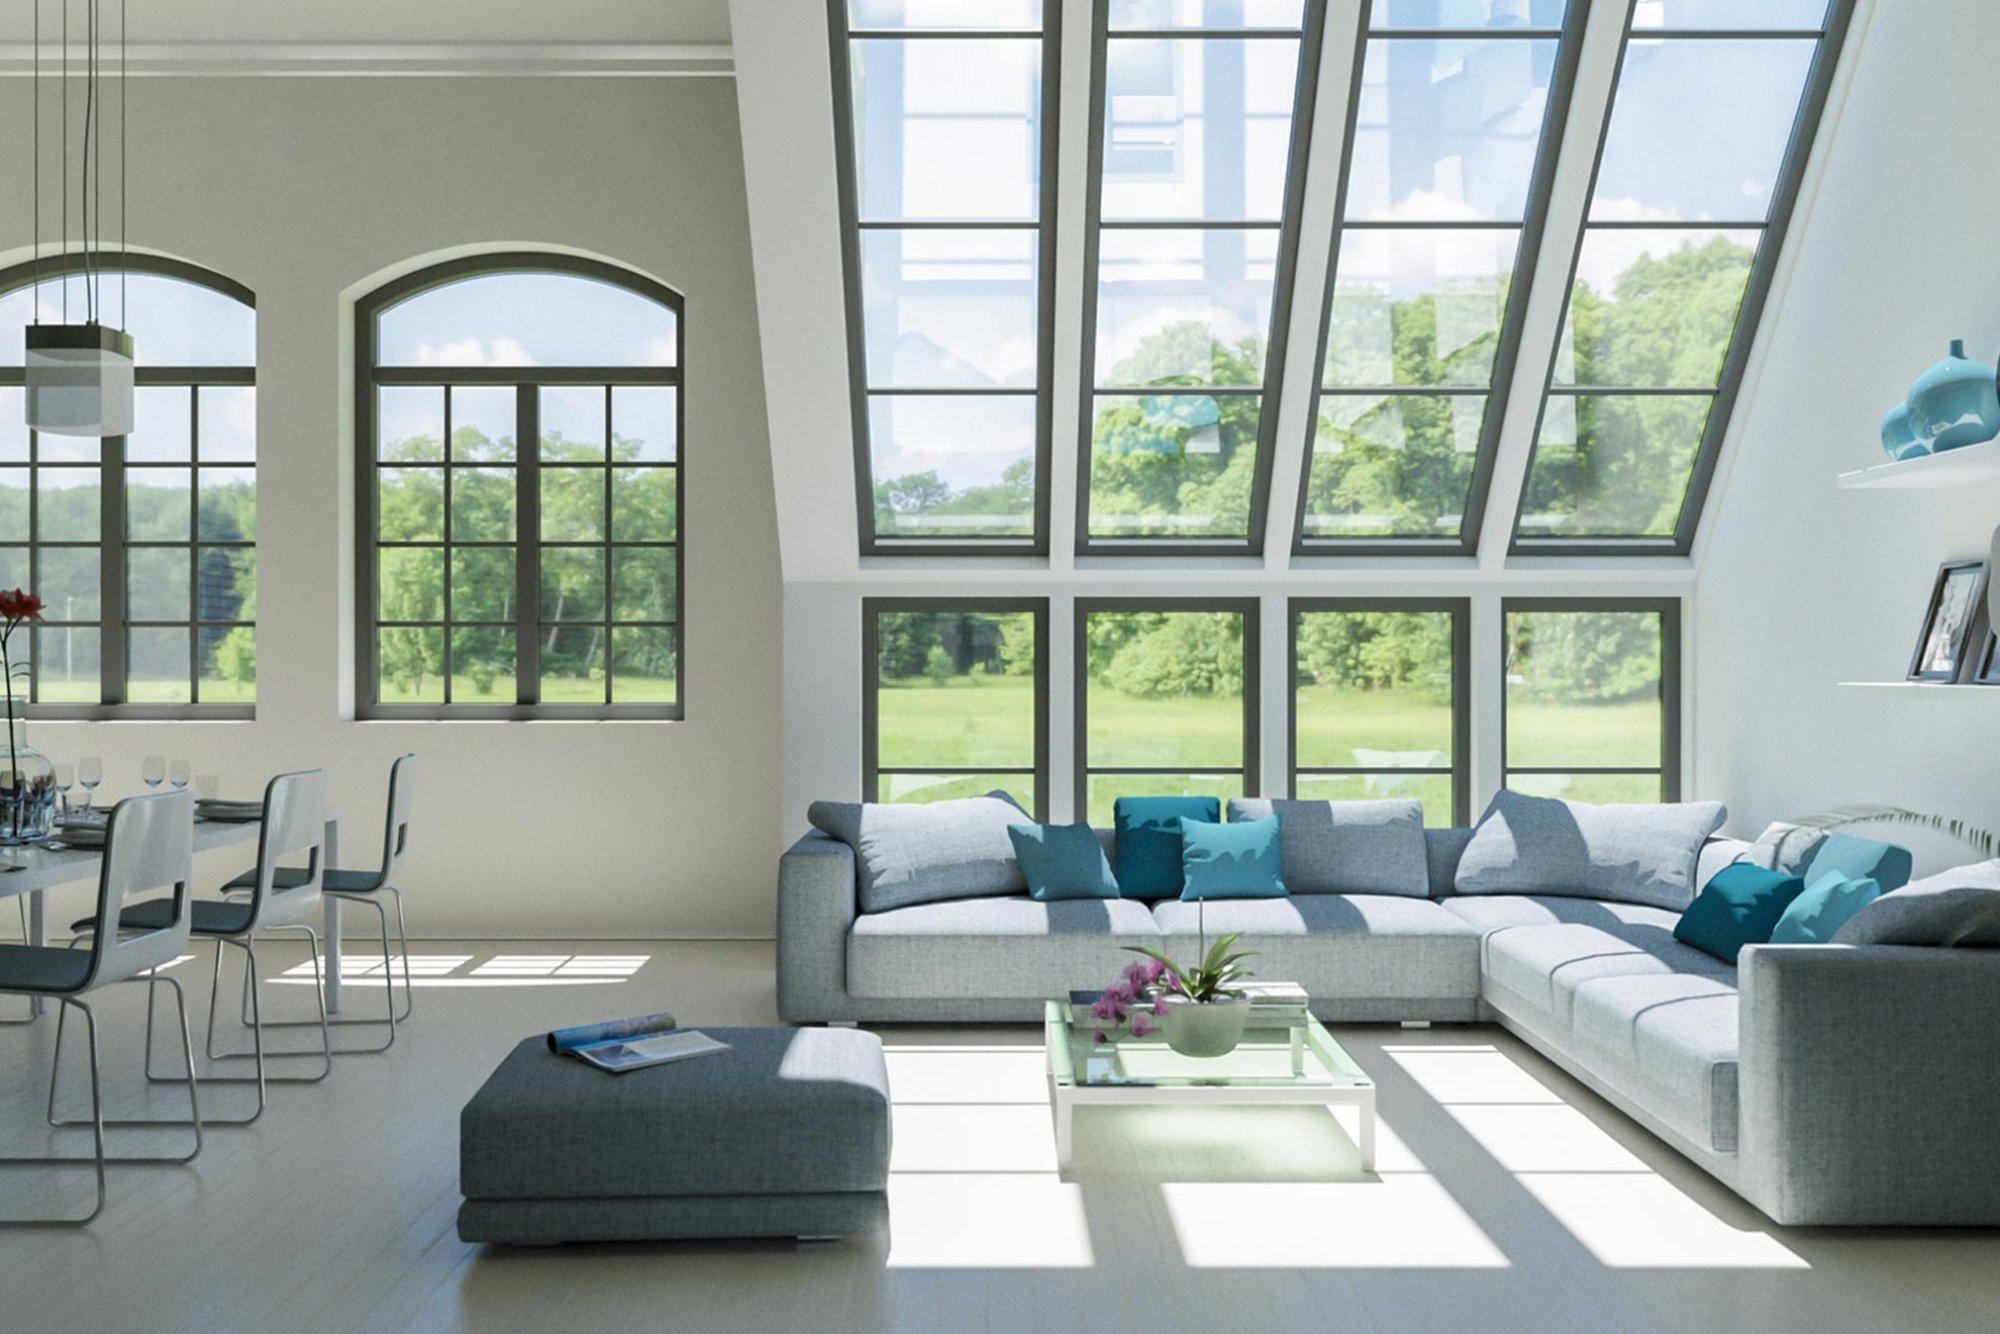 startseite oesterle gmbh immobilien. Black Bedroom Furniture Sets. Home Design Ideas